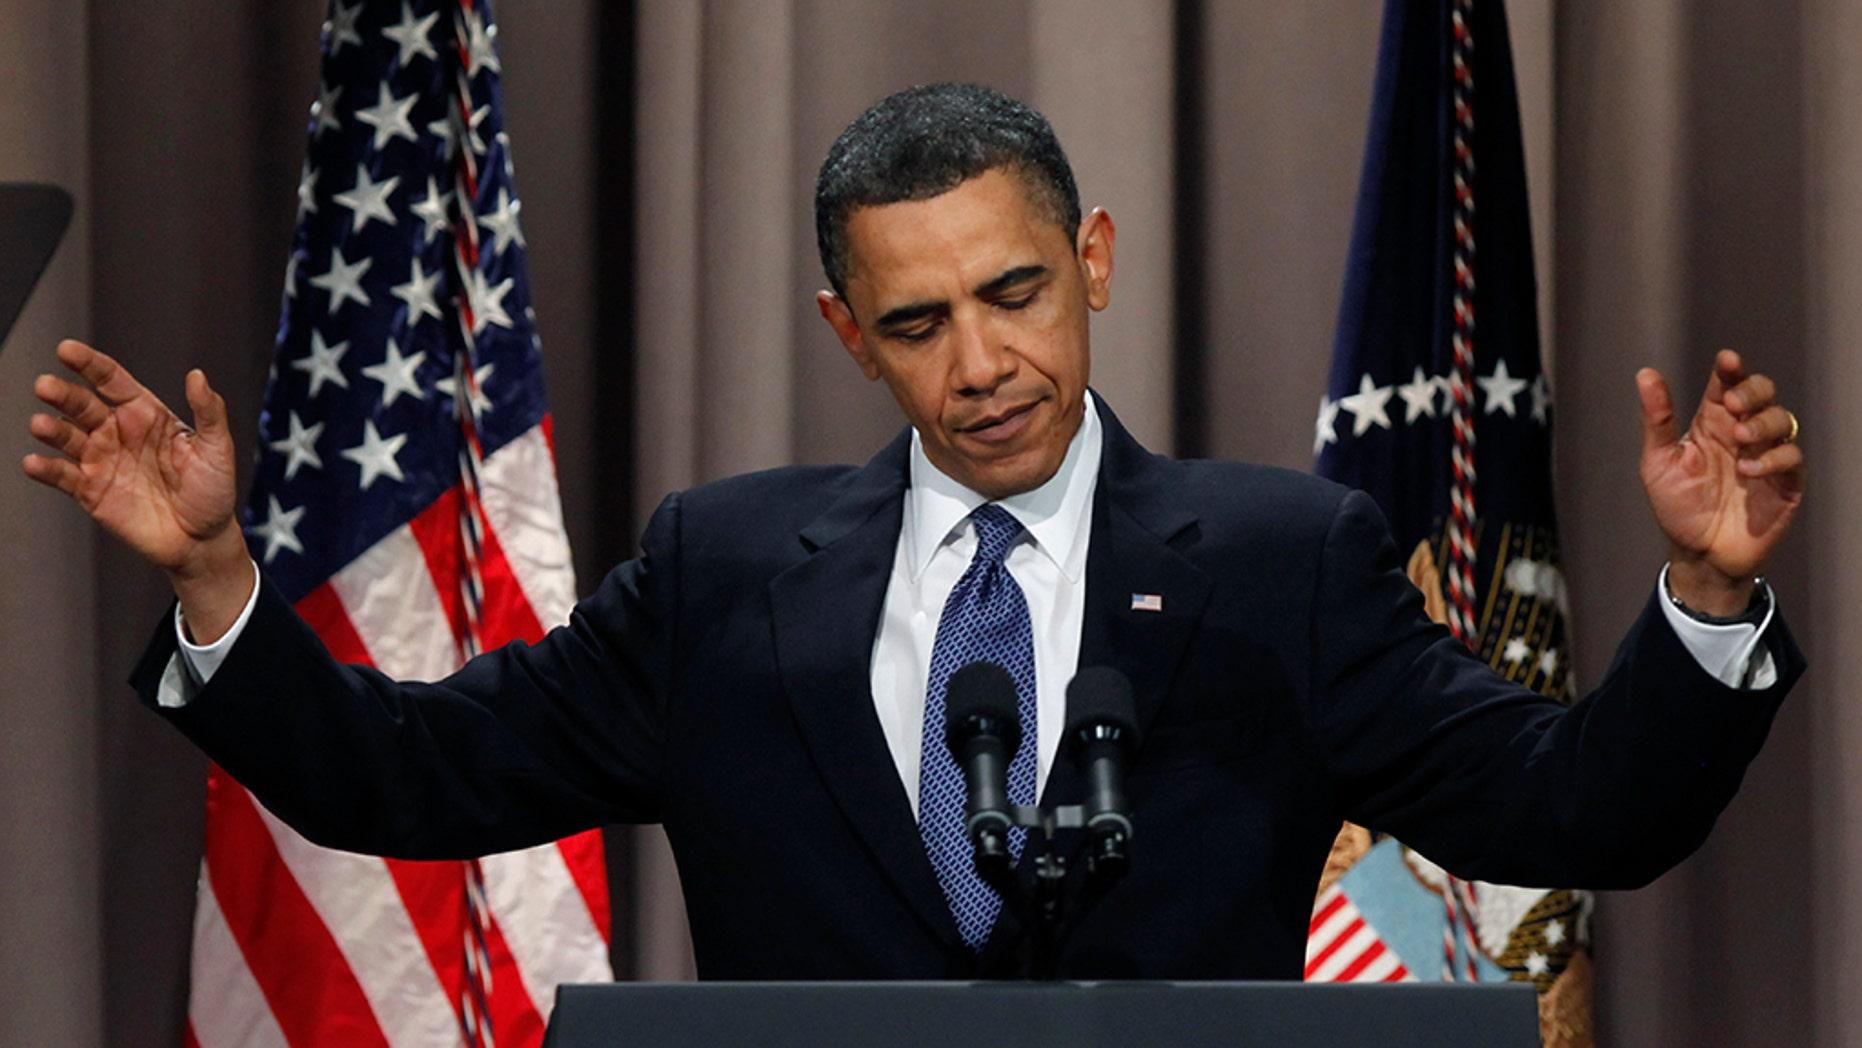 President Barack Obama speaks at Cooper Union in New York April 22, 2010.